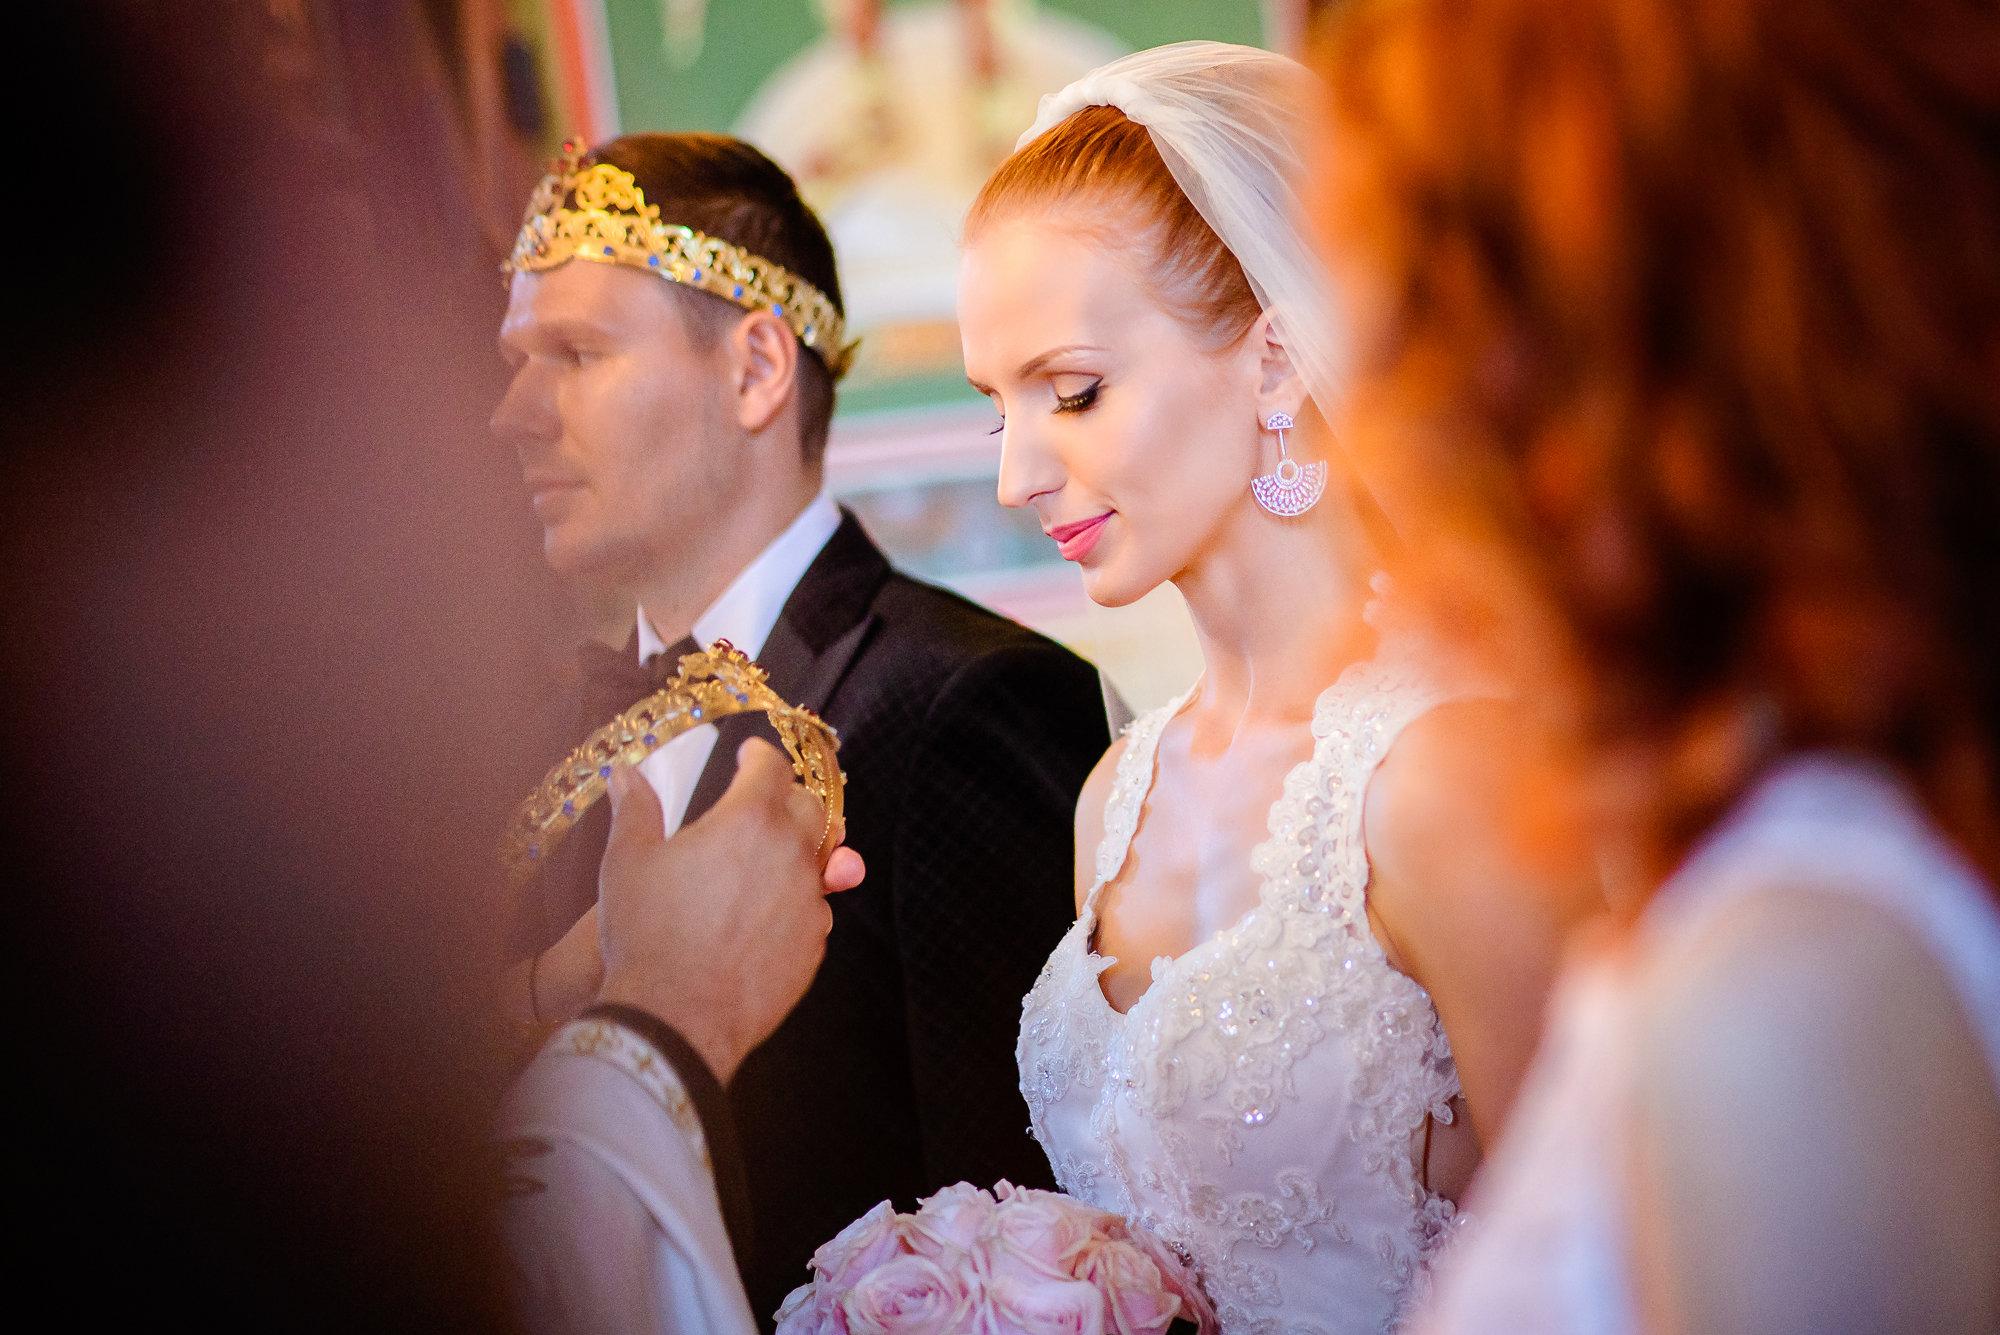 alexandru madalina wedding day 17